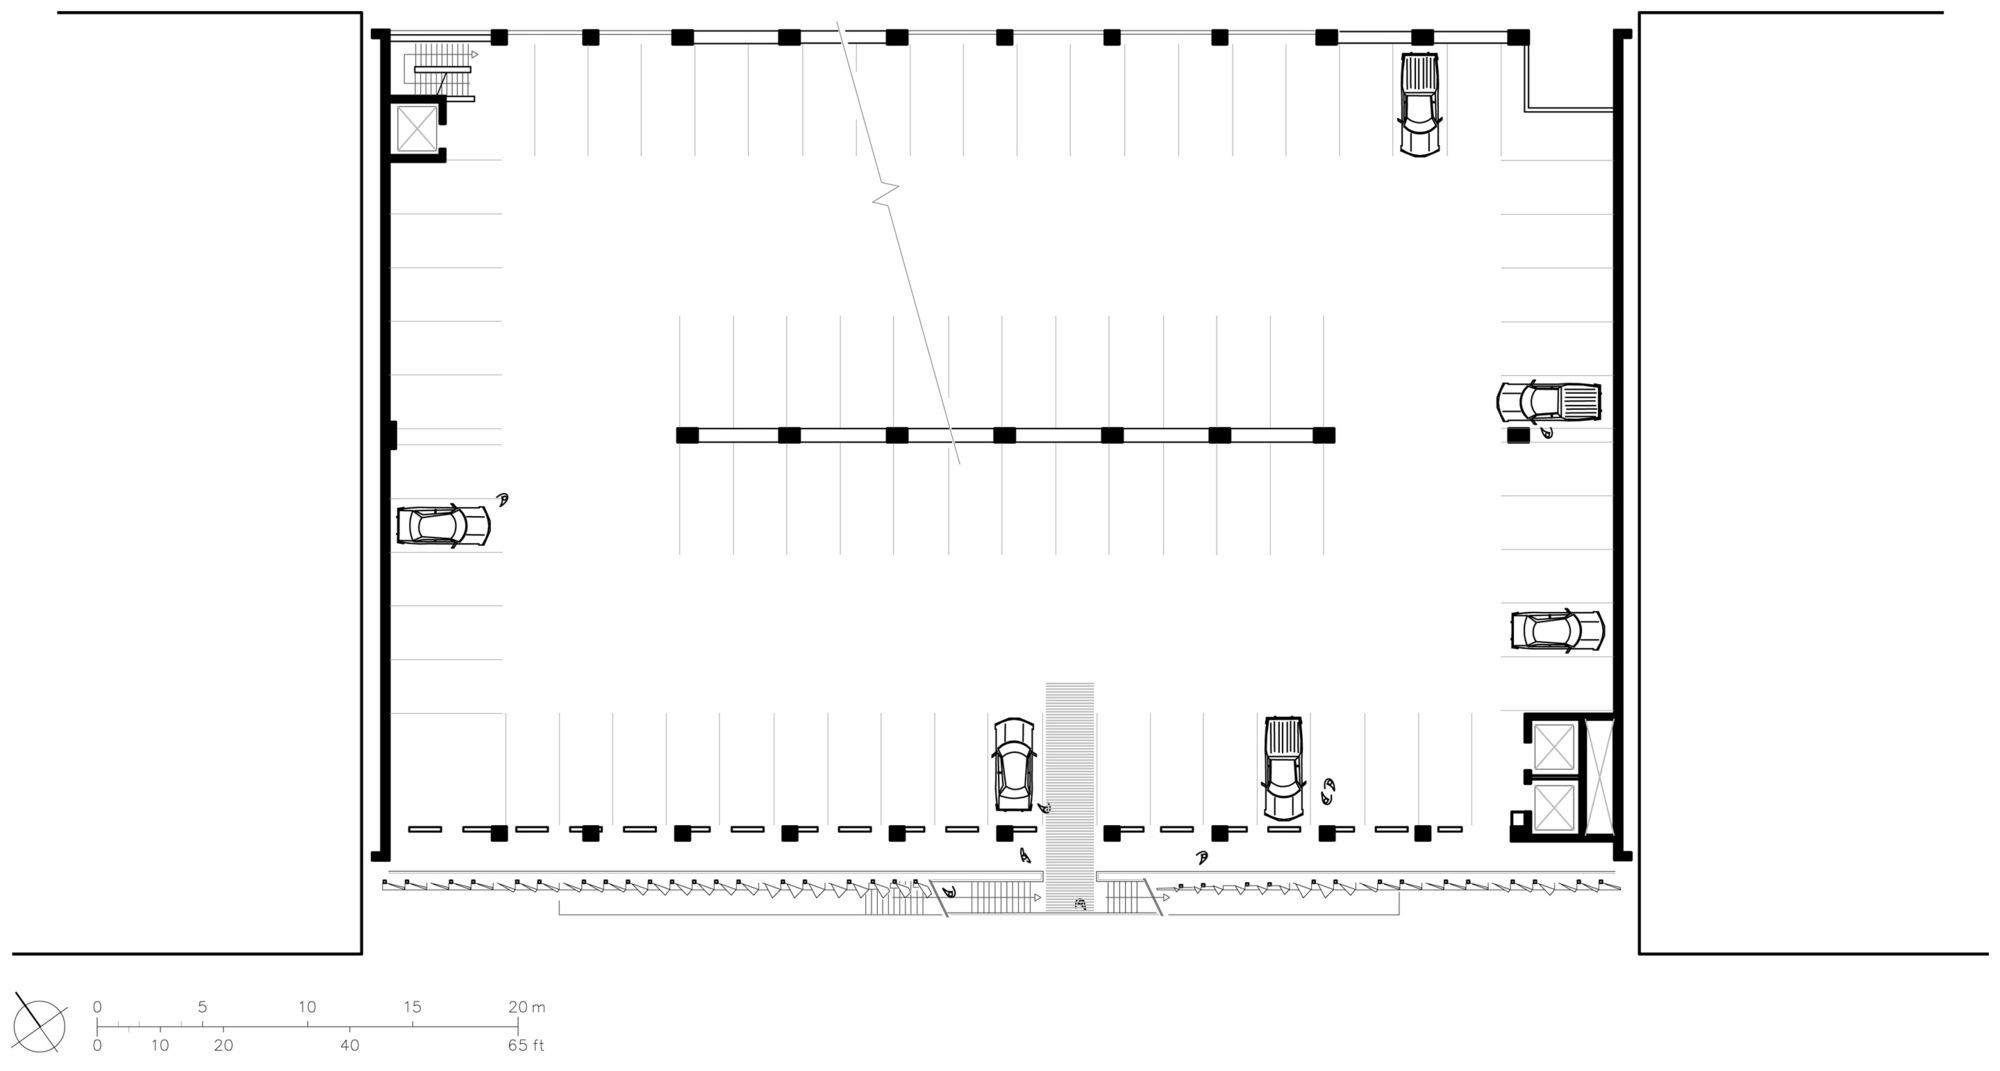 571c8012e58ece2823000112 City Of Santa Monica Parking Structure 6 Behnisch Architekten Studio Jantzen Floor Plan on Parking Garage Floor Plan